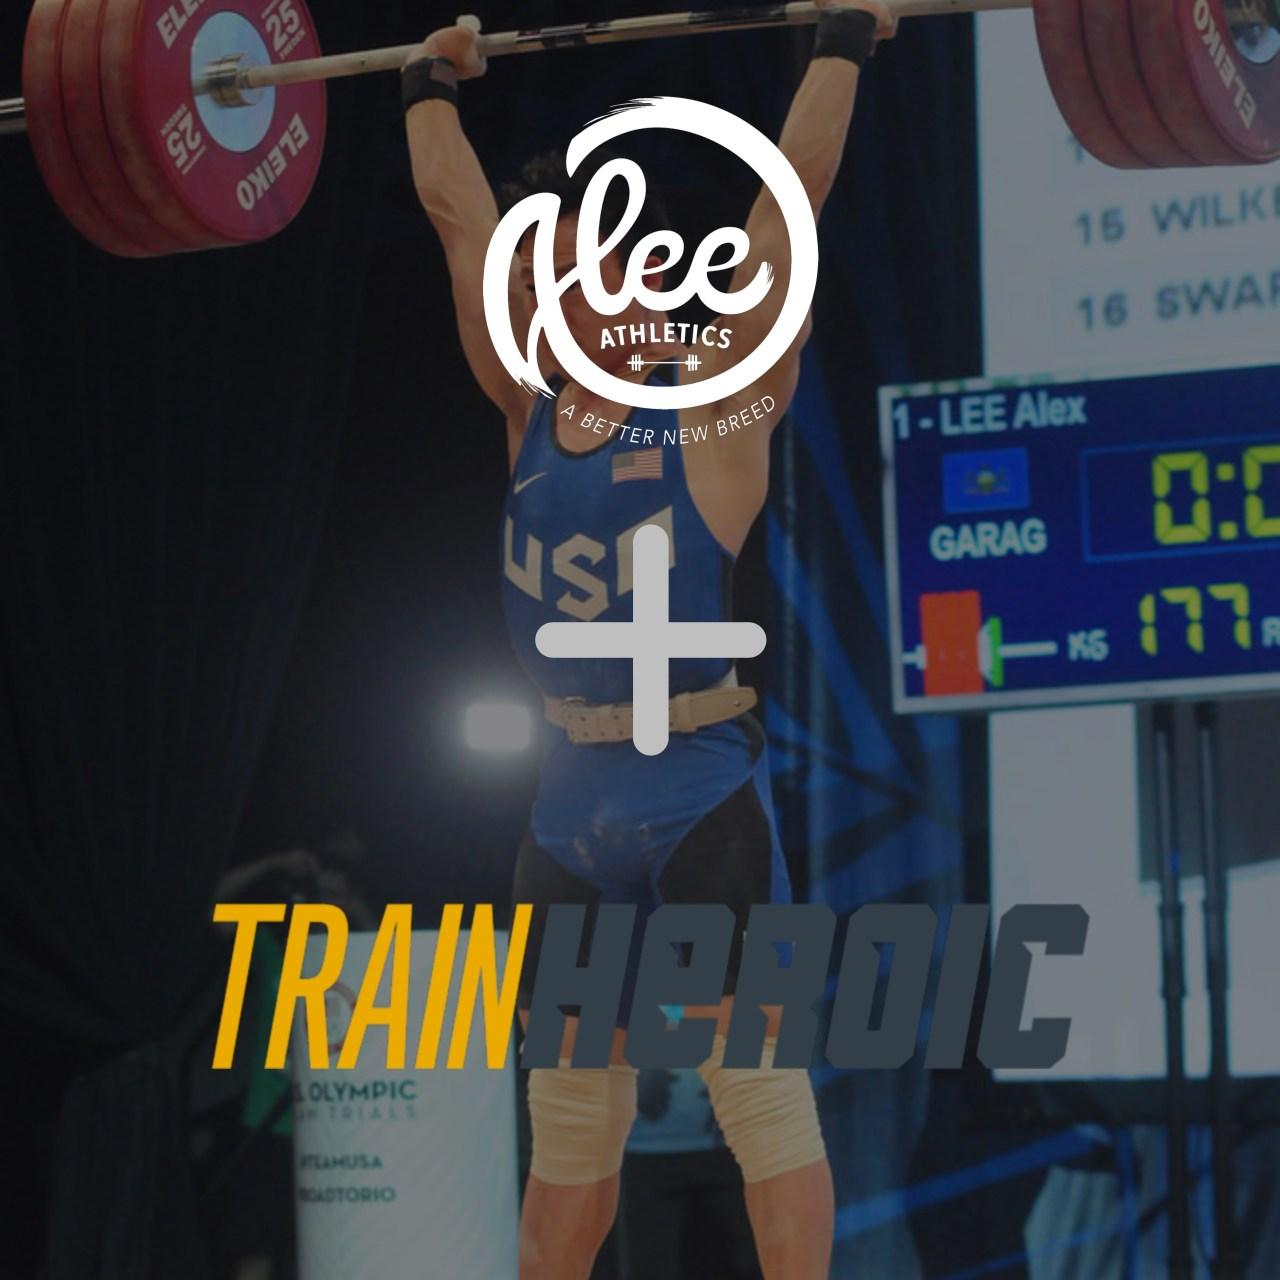 Alee+Train.jpg